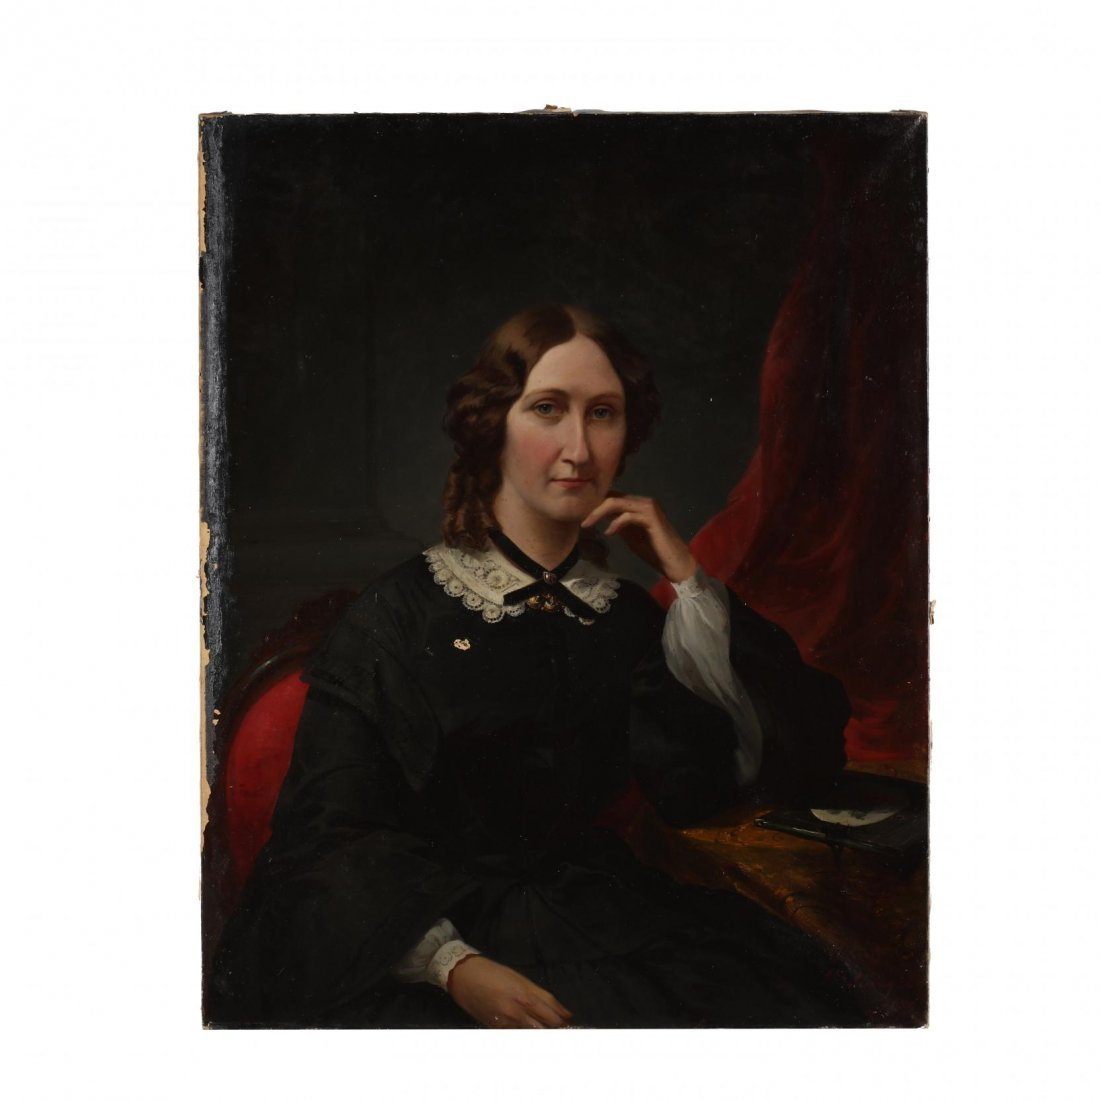 John Beaufain Irving (SC, 1825-1877), Portrait of a